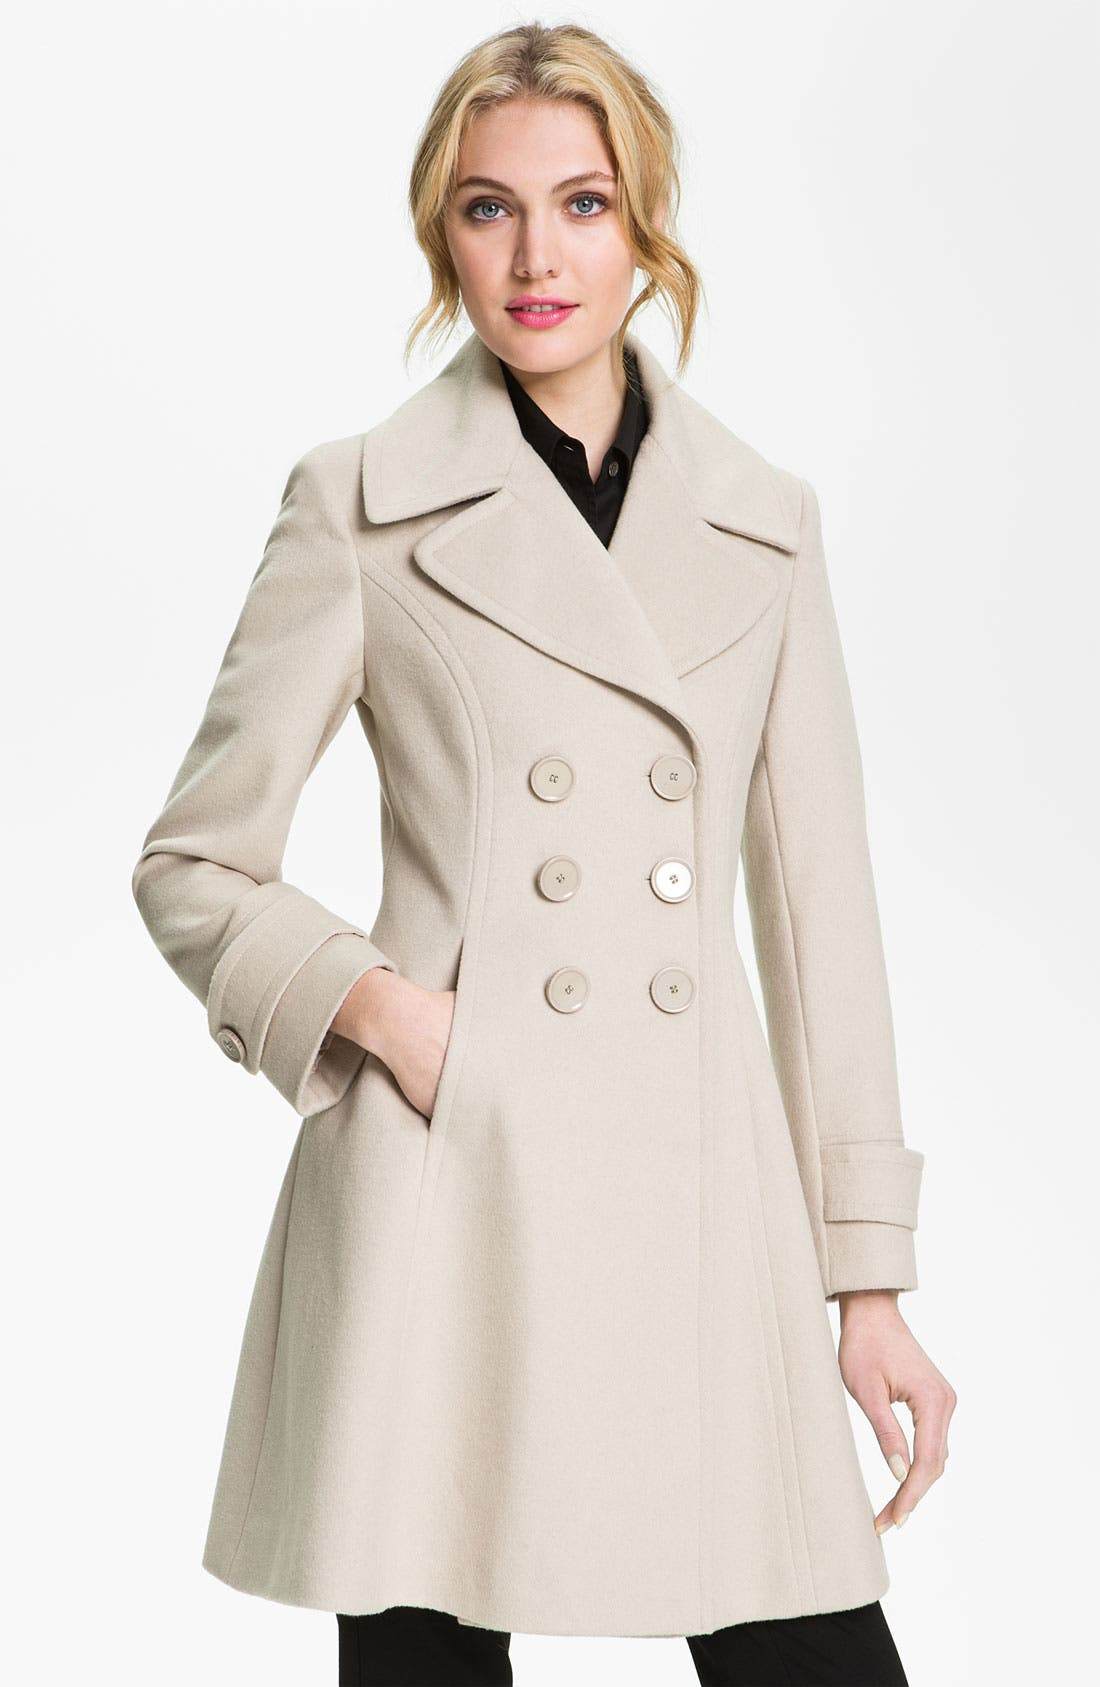 Main Image - T Tahari 'Darla' Wool Blend Fit & Flare Coat (Online Only)